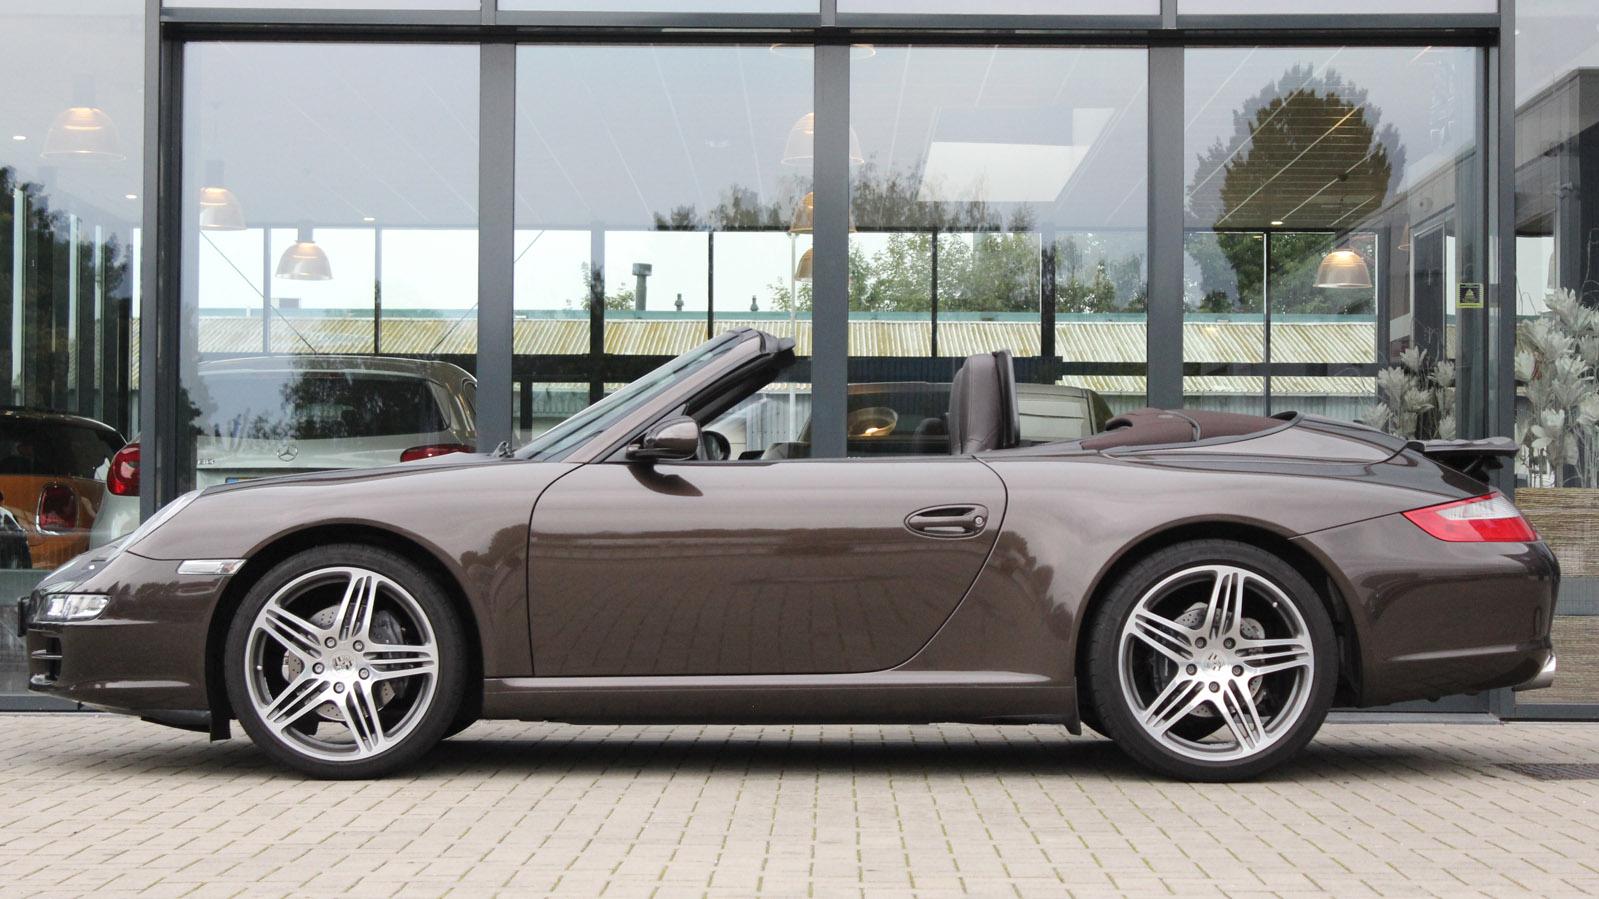 Porsche 911 997 3 6 liberty cars exclusive automotive for Motor car portfolio site inventory